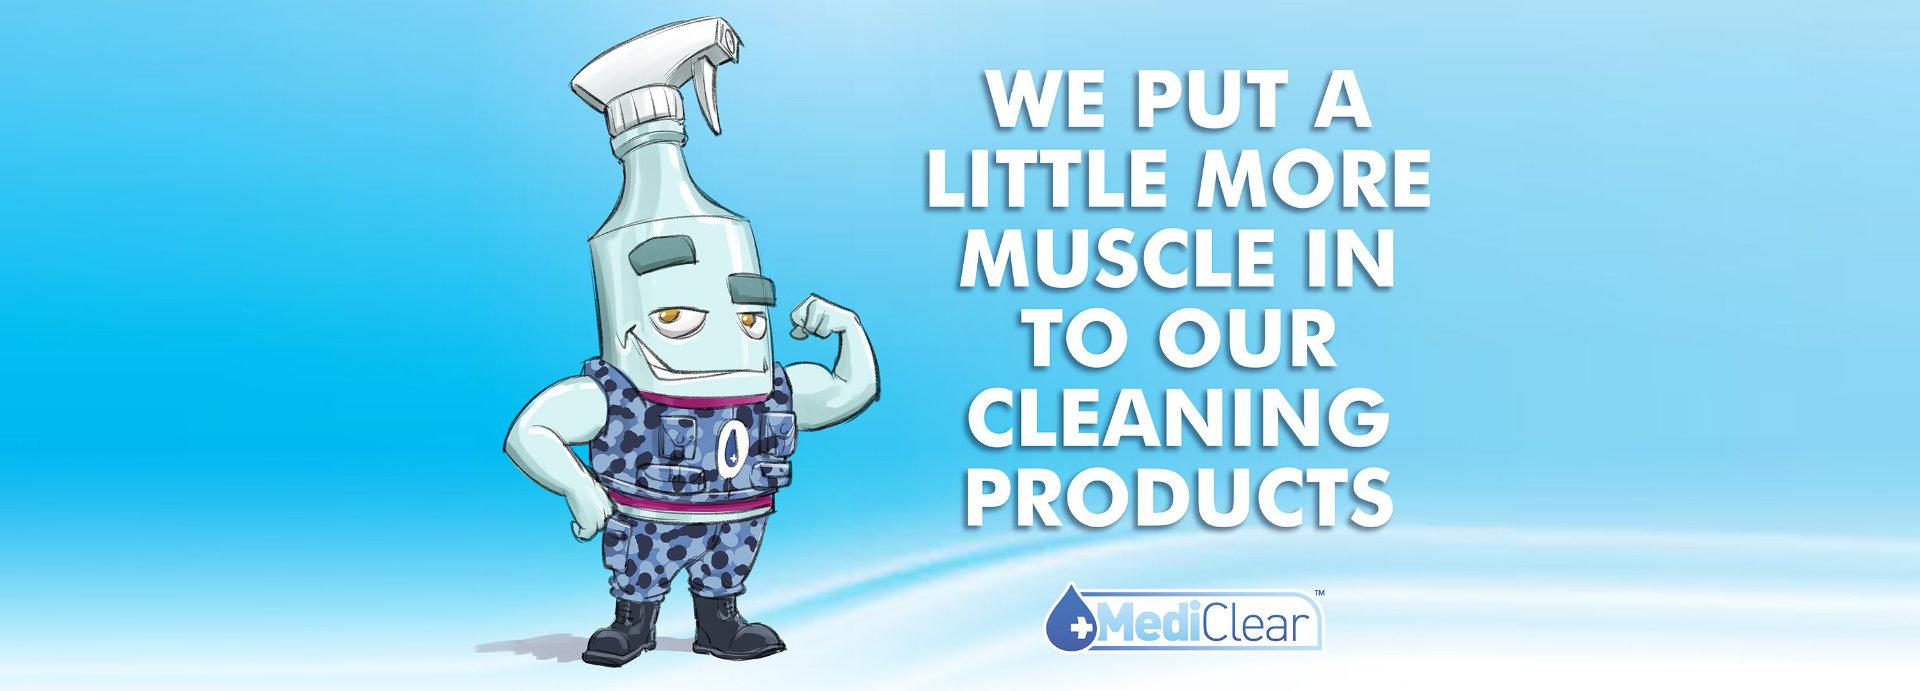 mediclear-banner-1